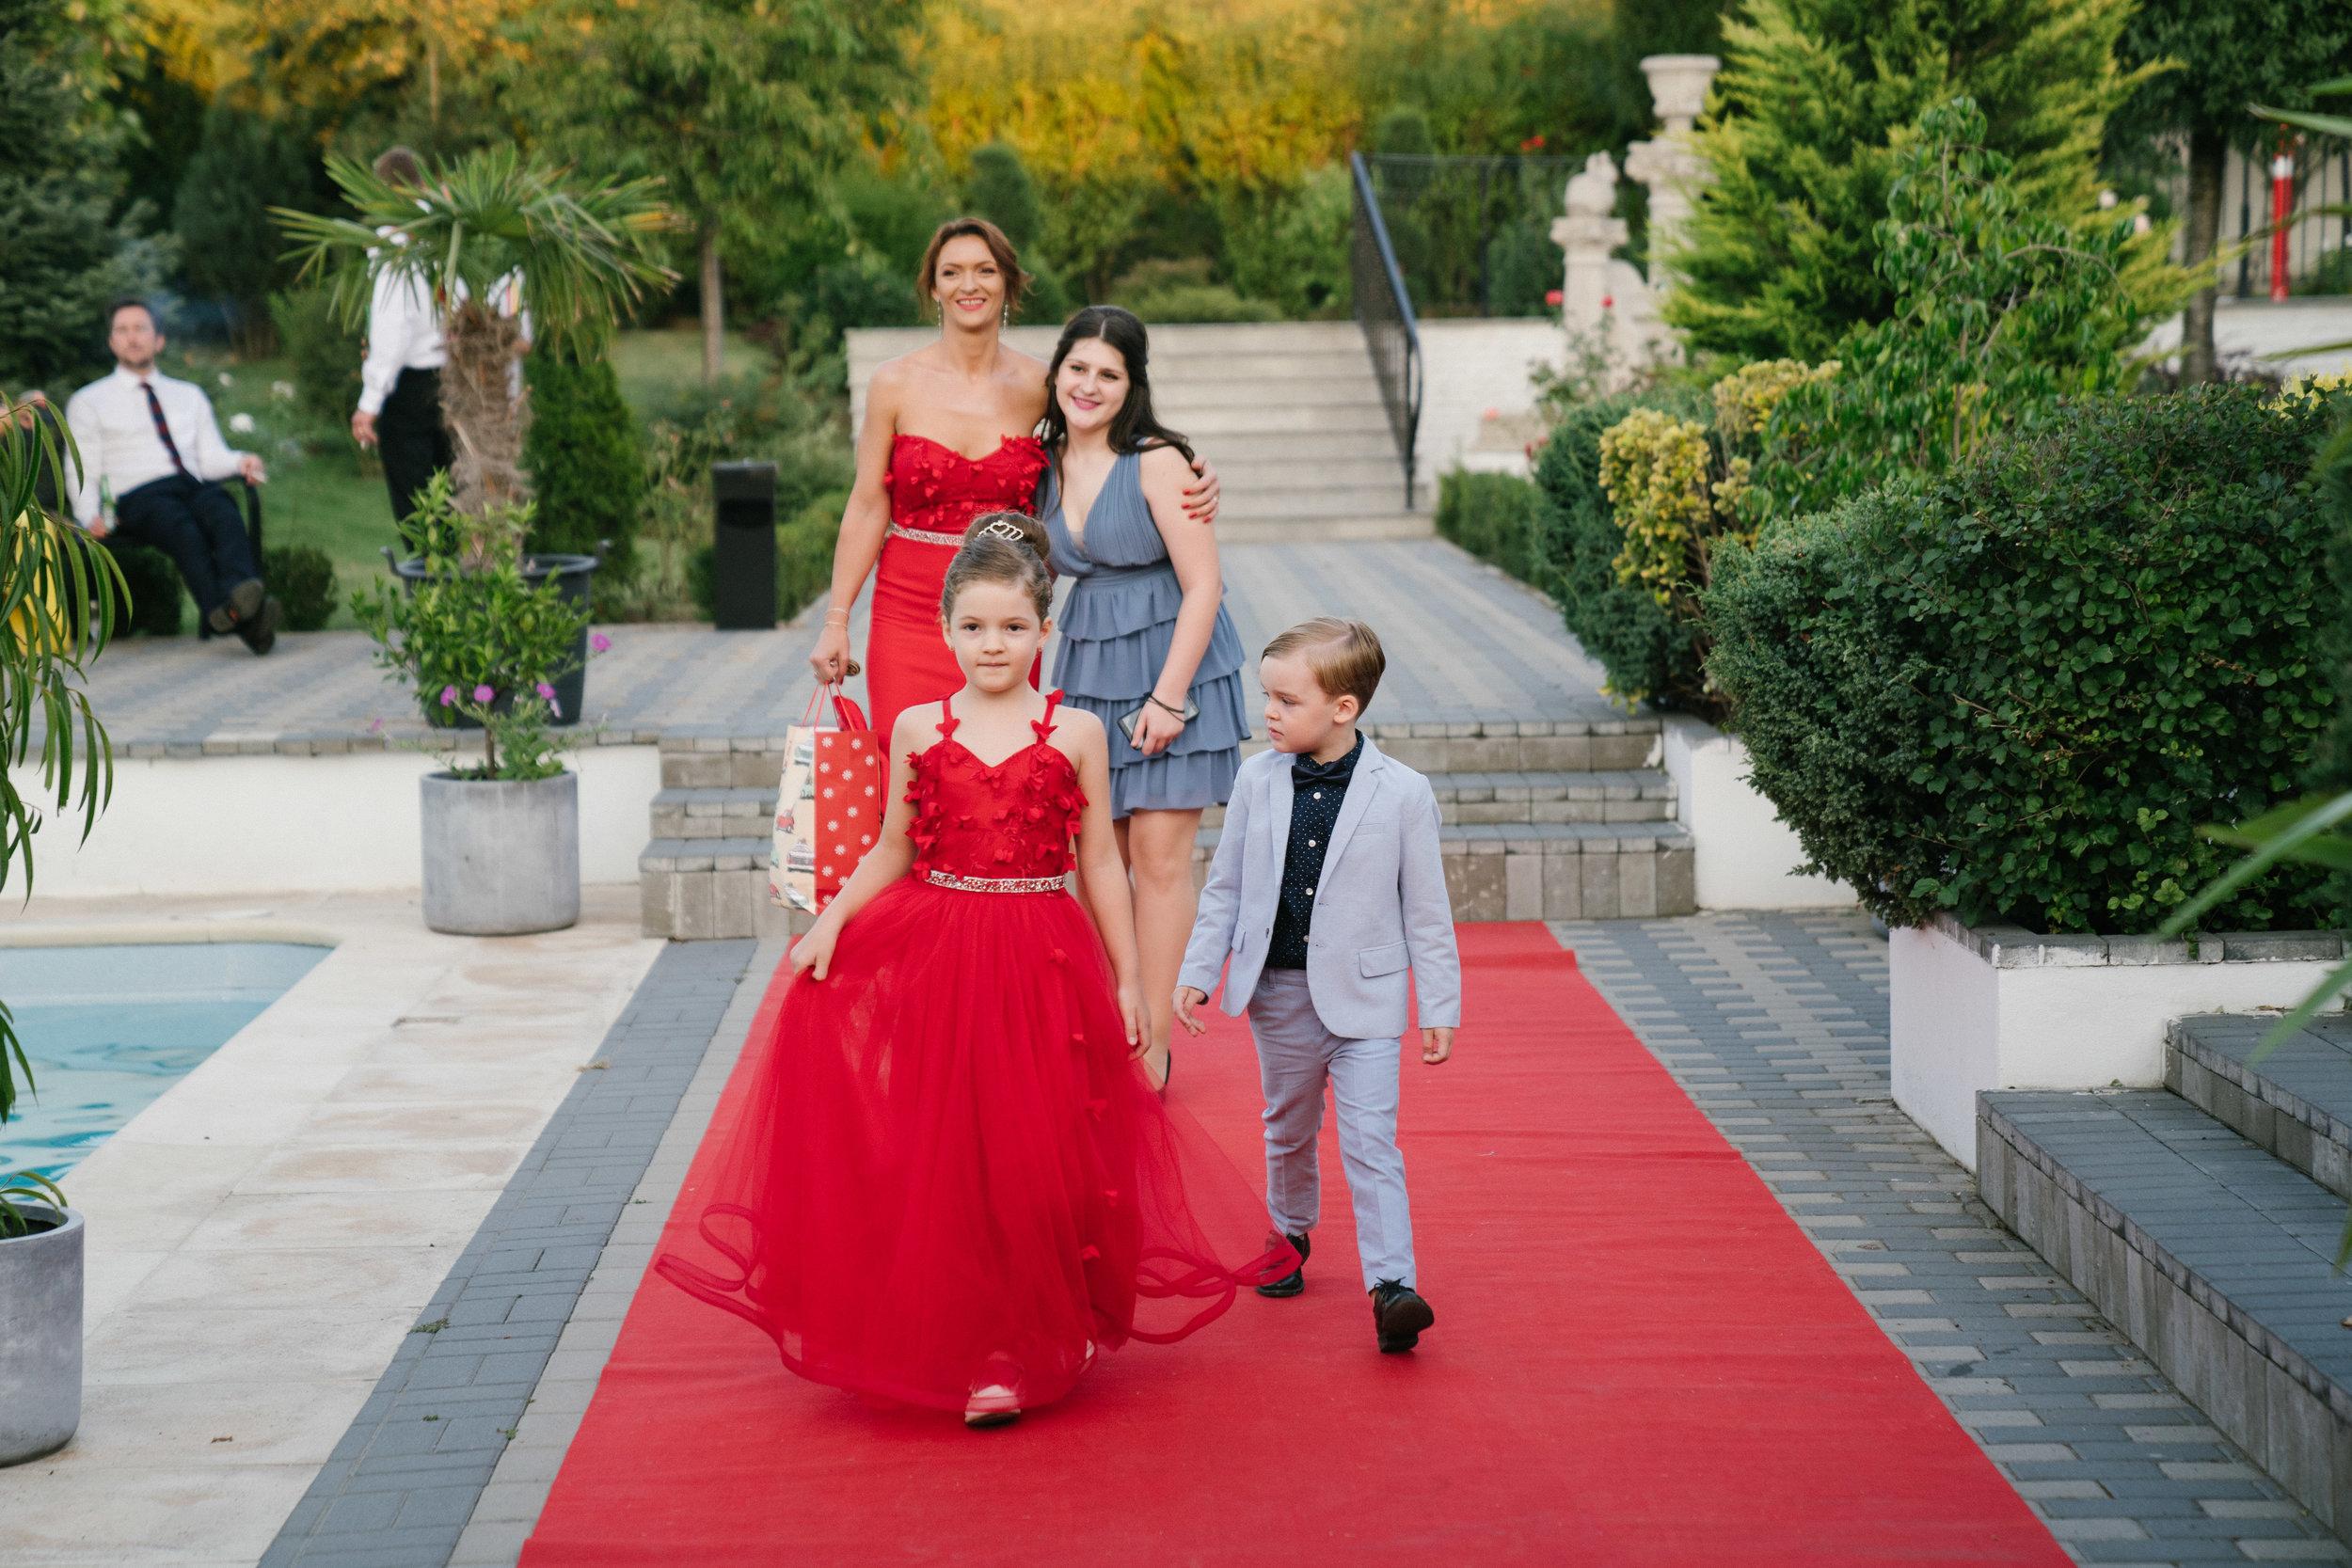 london-romania-destination-wedding-photographer-videographer-85